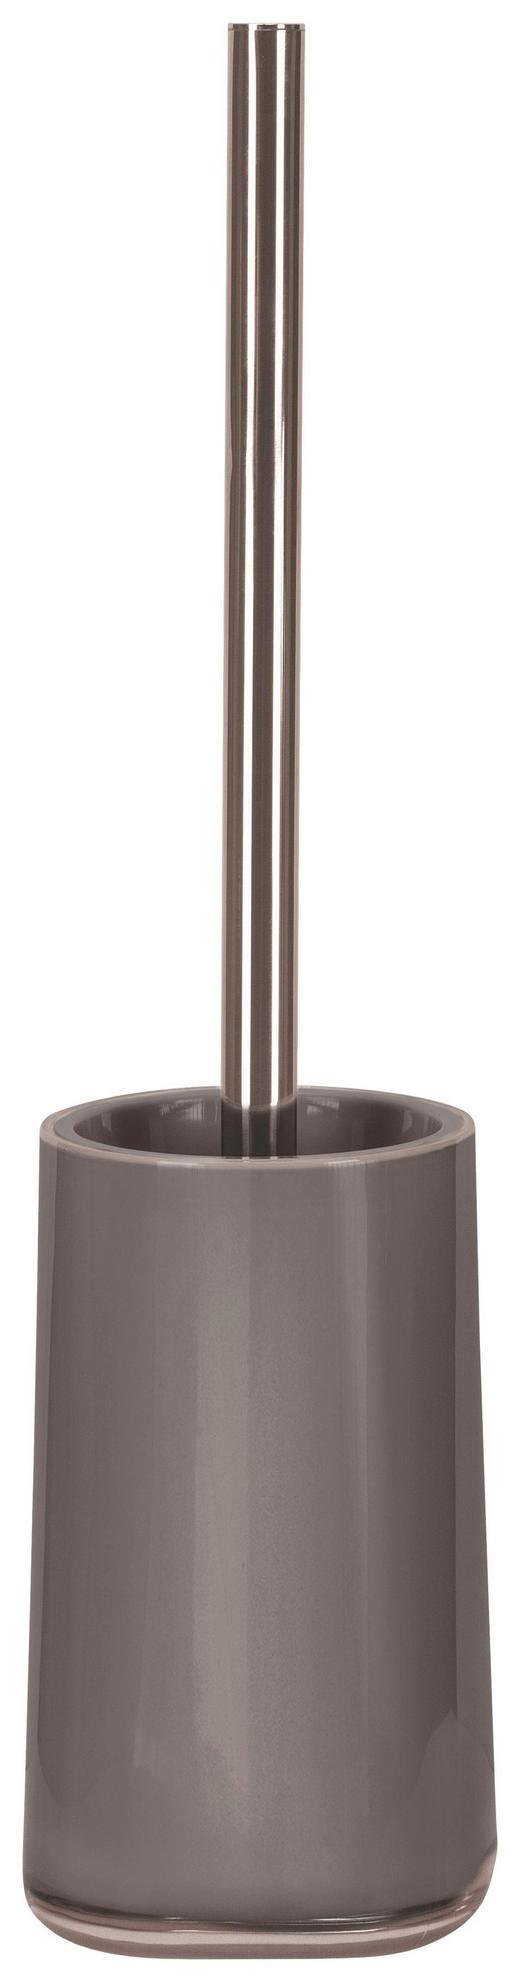 WC-BÜRSTENGARNITUR in Kunststoff - Platinfarben/Chromfarben, Basics, Kunststoff (9,6/39/9,6cm) - Kleine Wolke